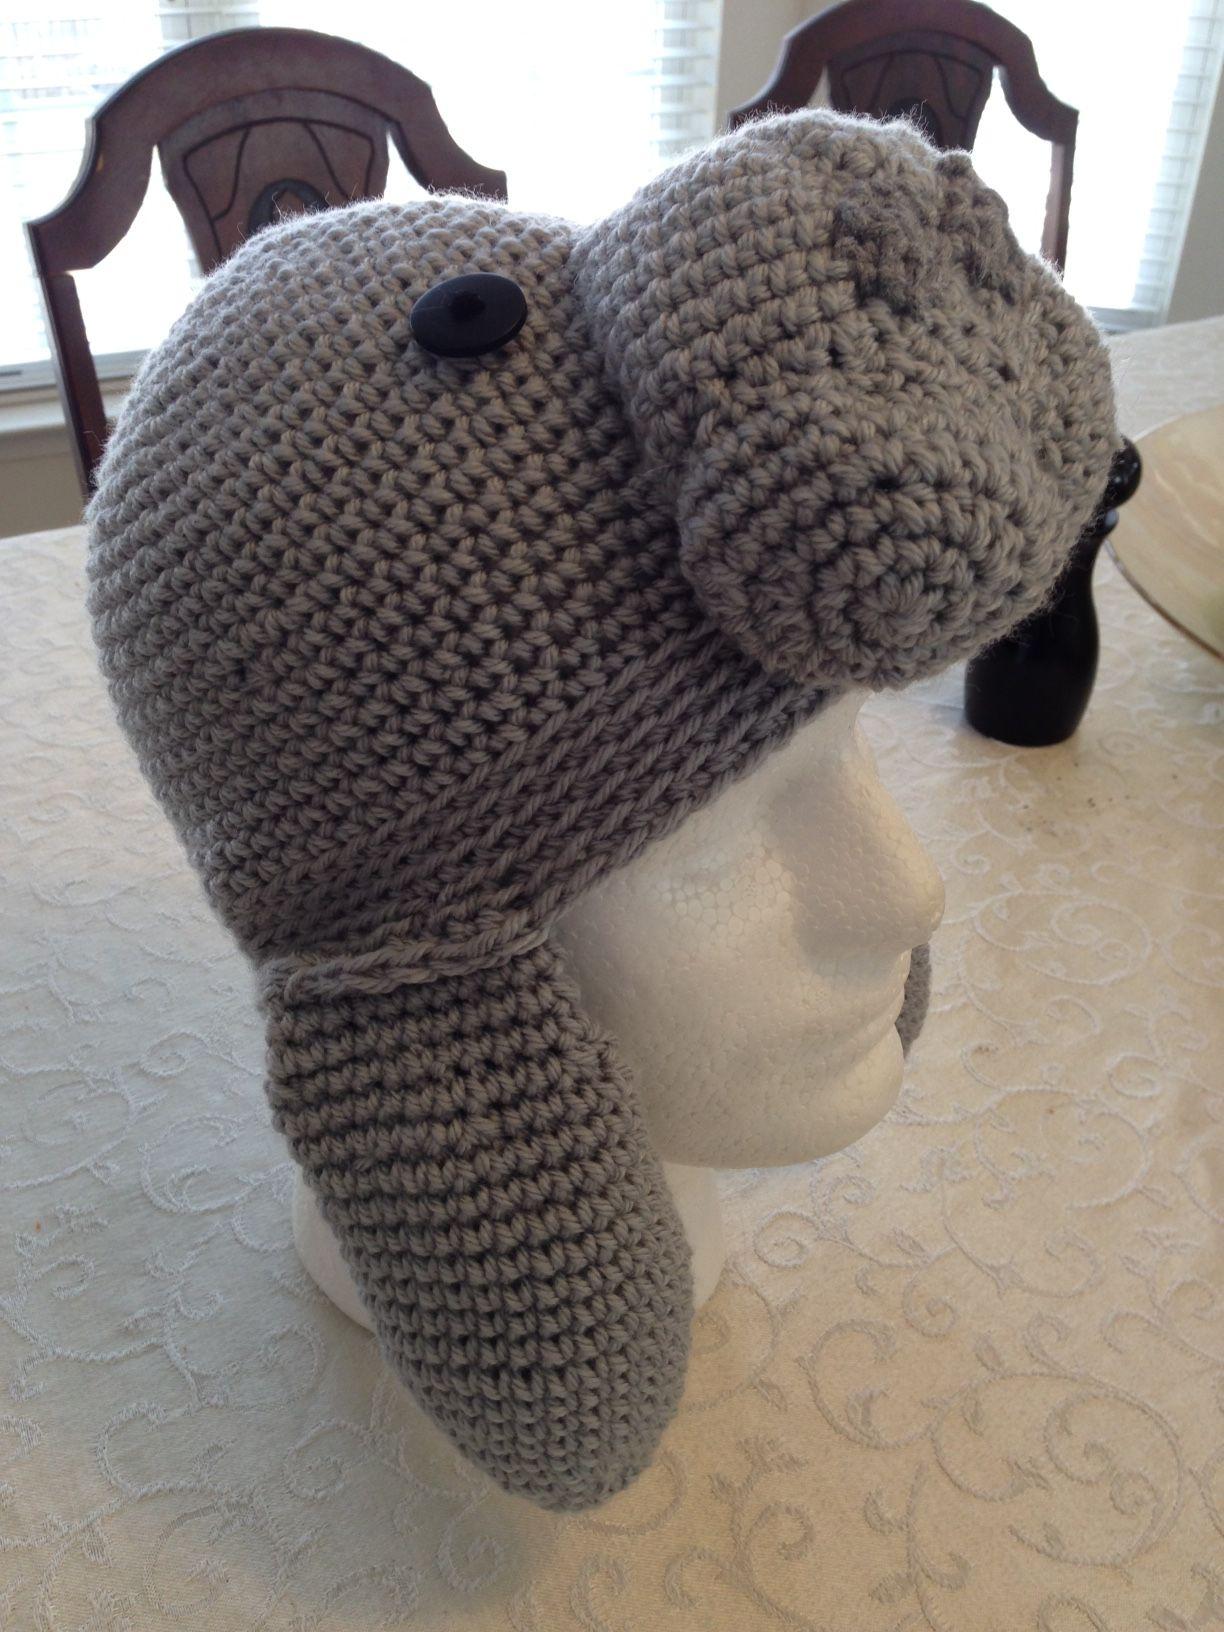 Crochet Manatee hat | Crochet | Pinterest | Manatee, Crochet and Yarns